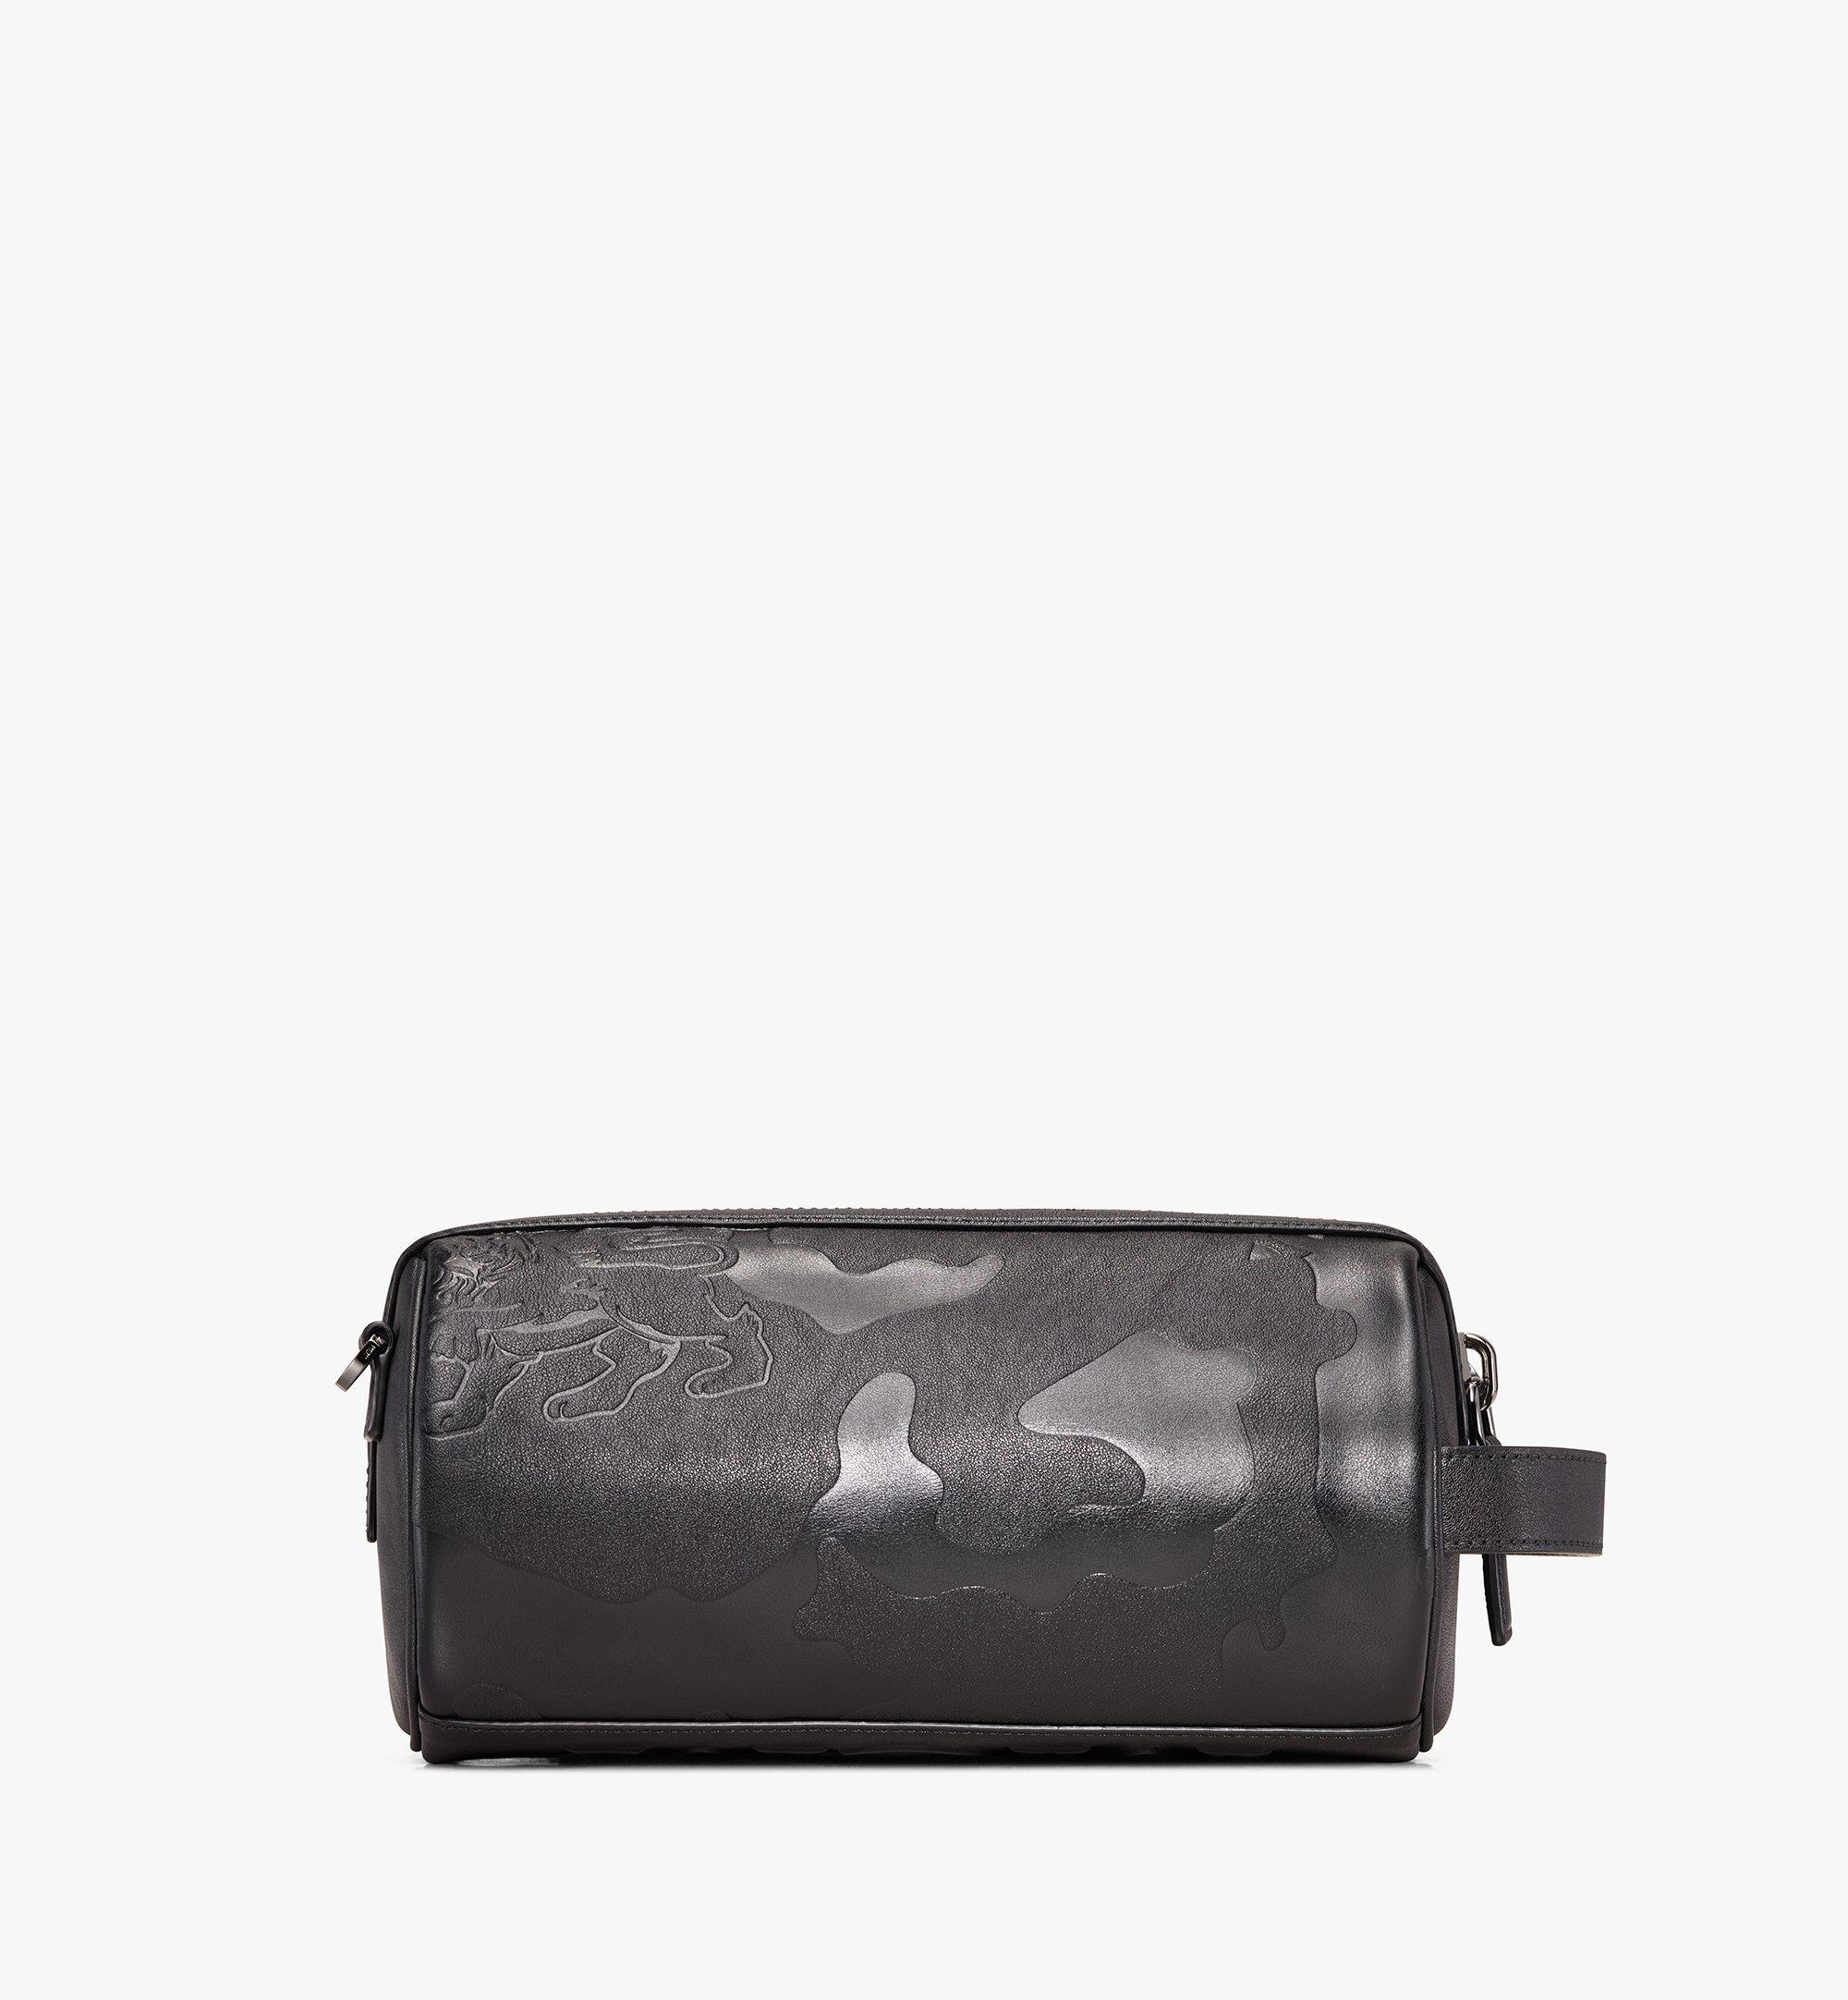 MCM Crossbody Bag in Embossed Lion Camo Black MUR9AES02BK001 Alternate View 3